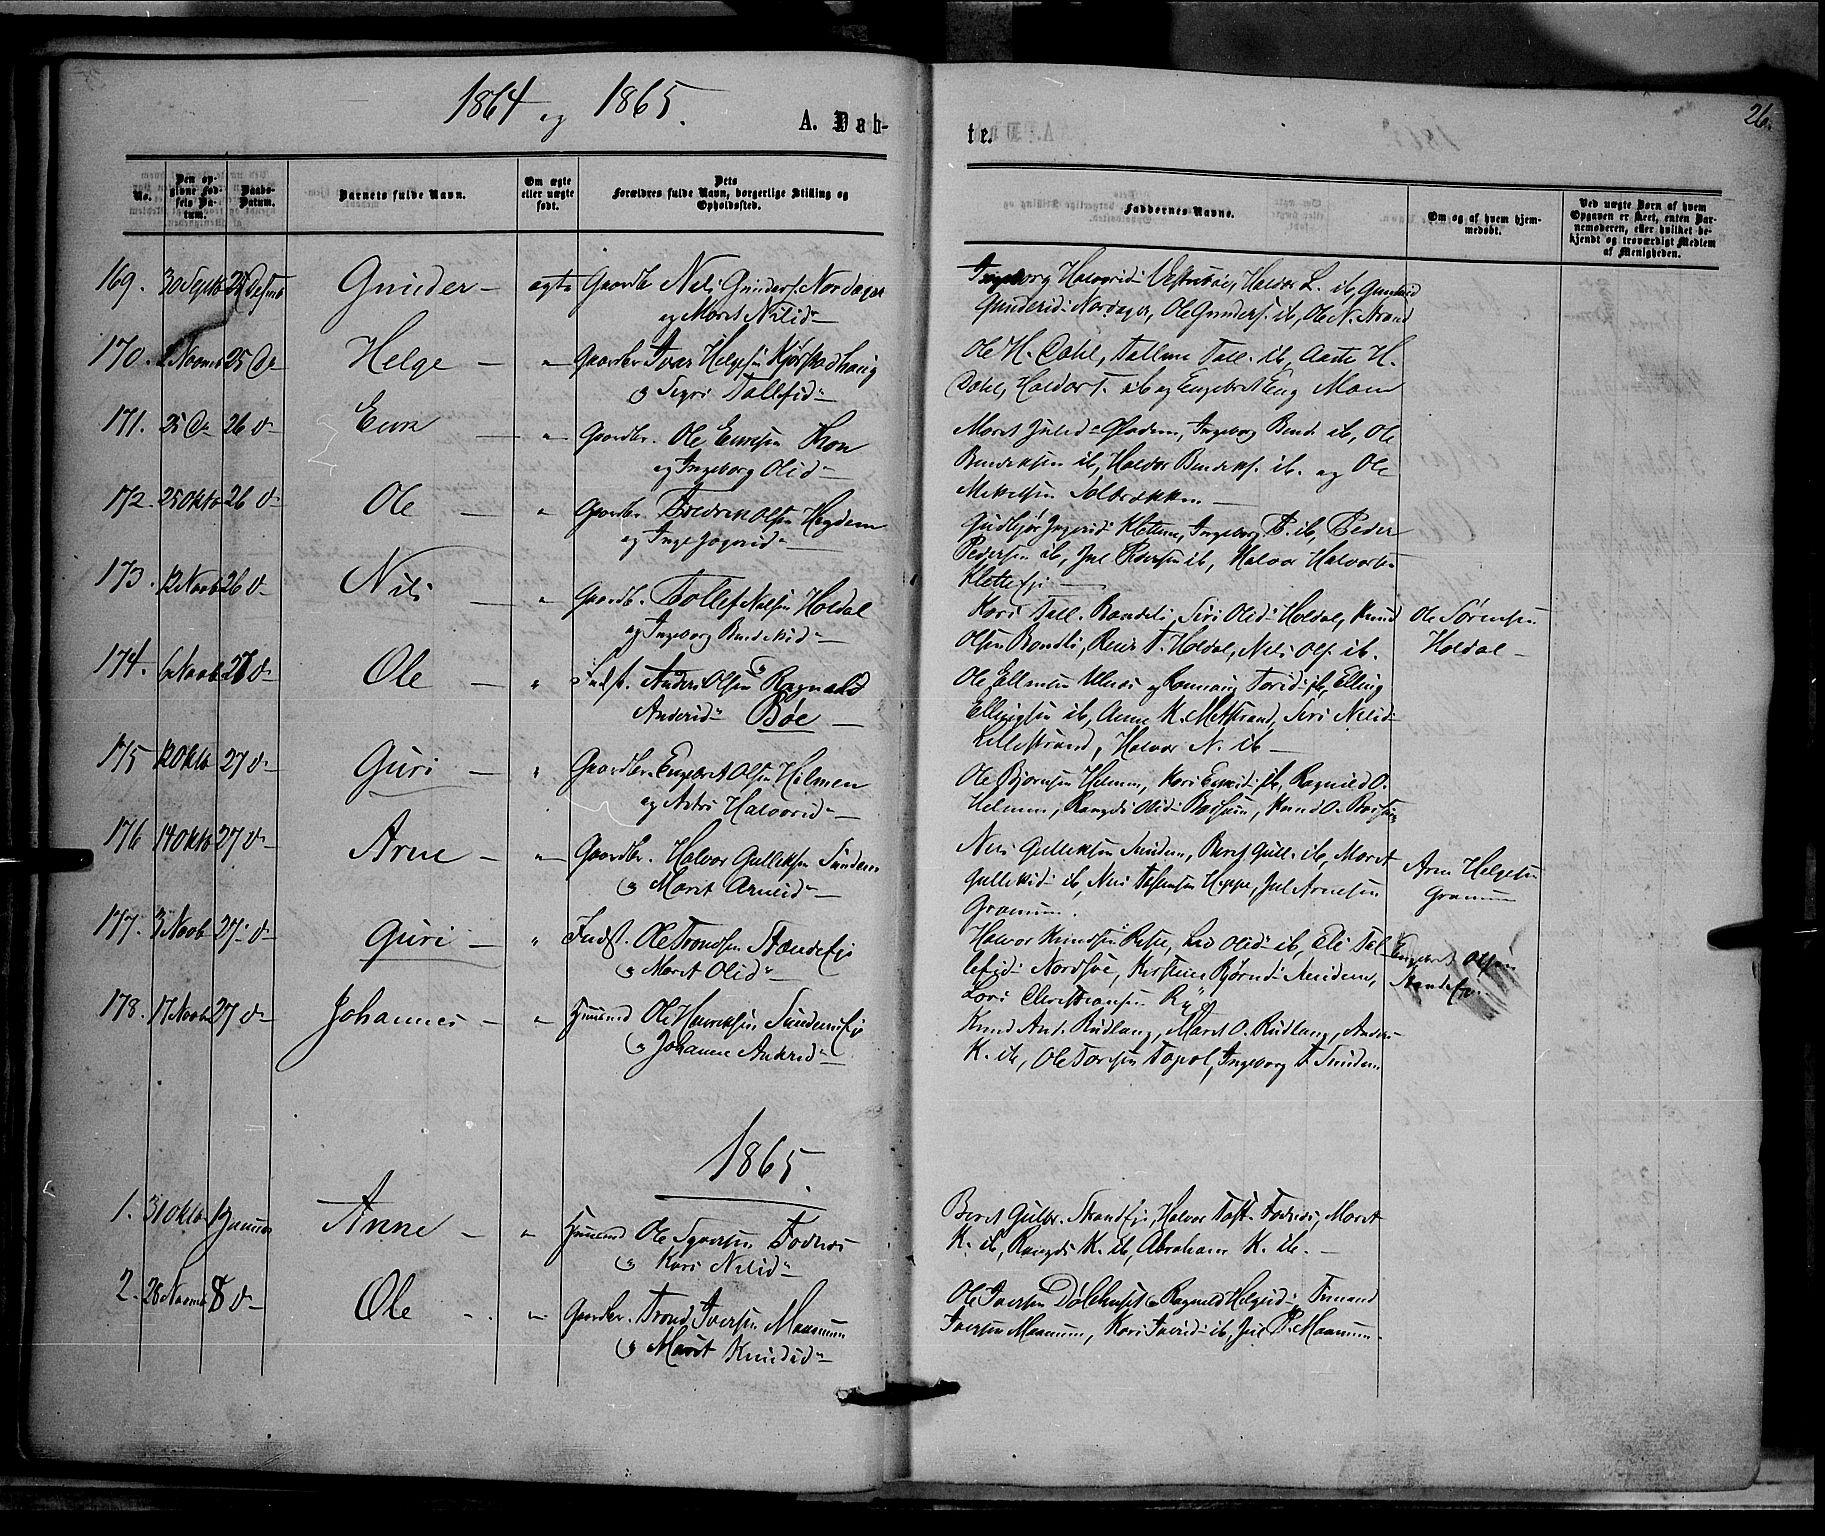 SAH, Nord-Aurdal prestekontor, Ministerialbok nr. 8, 1863-1875, s. 26